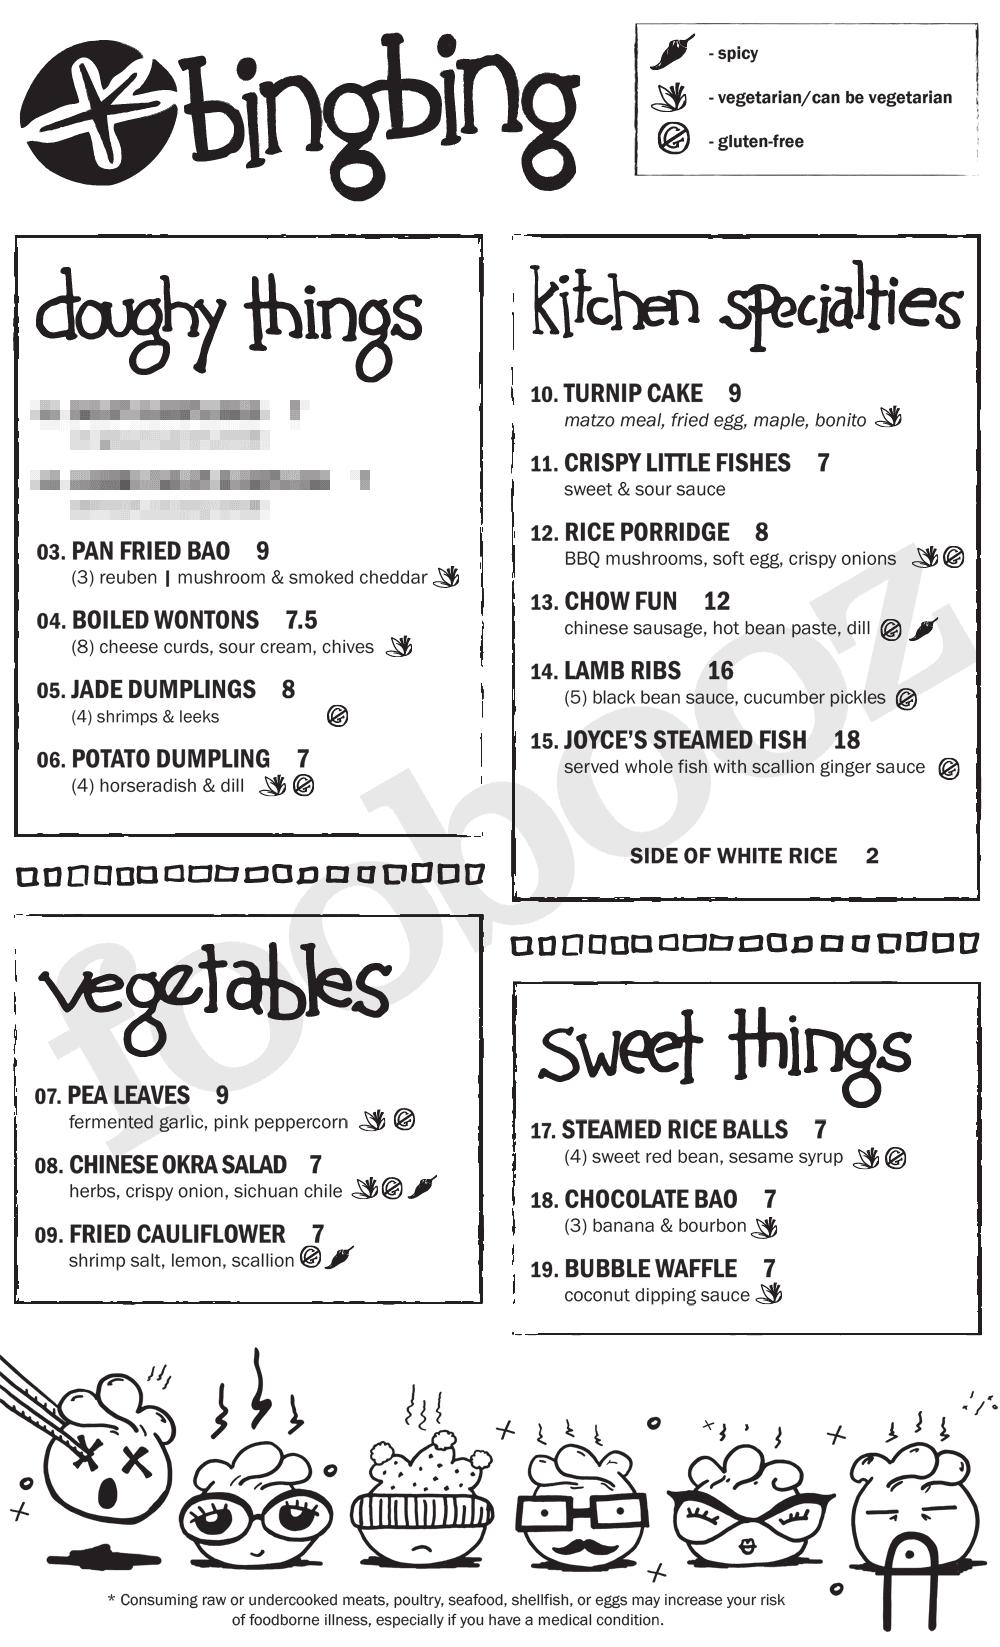 bing-bing-food-menu-draft